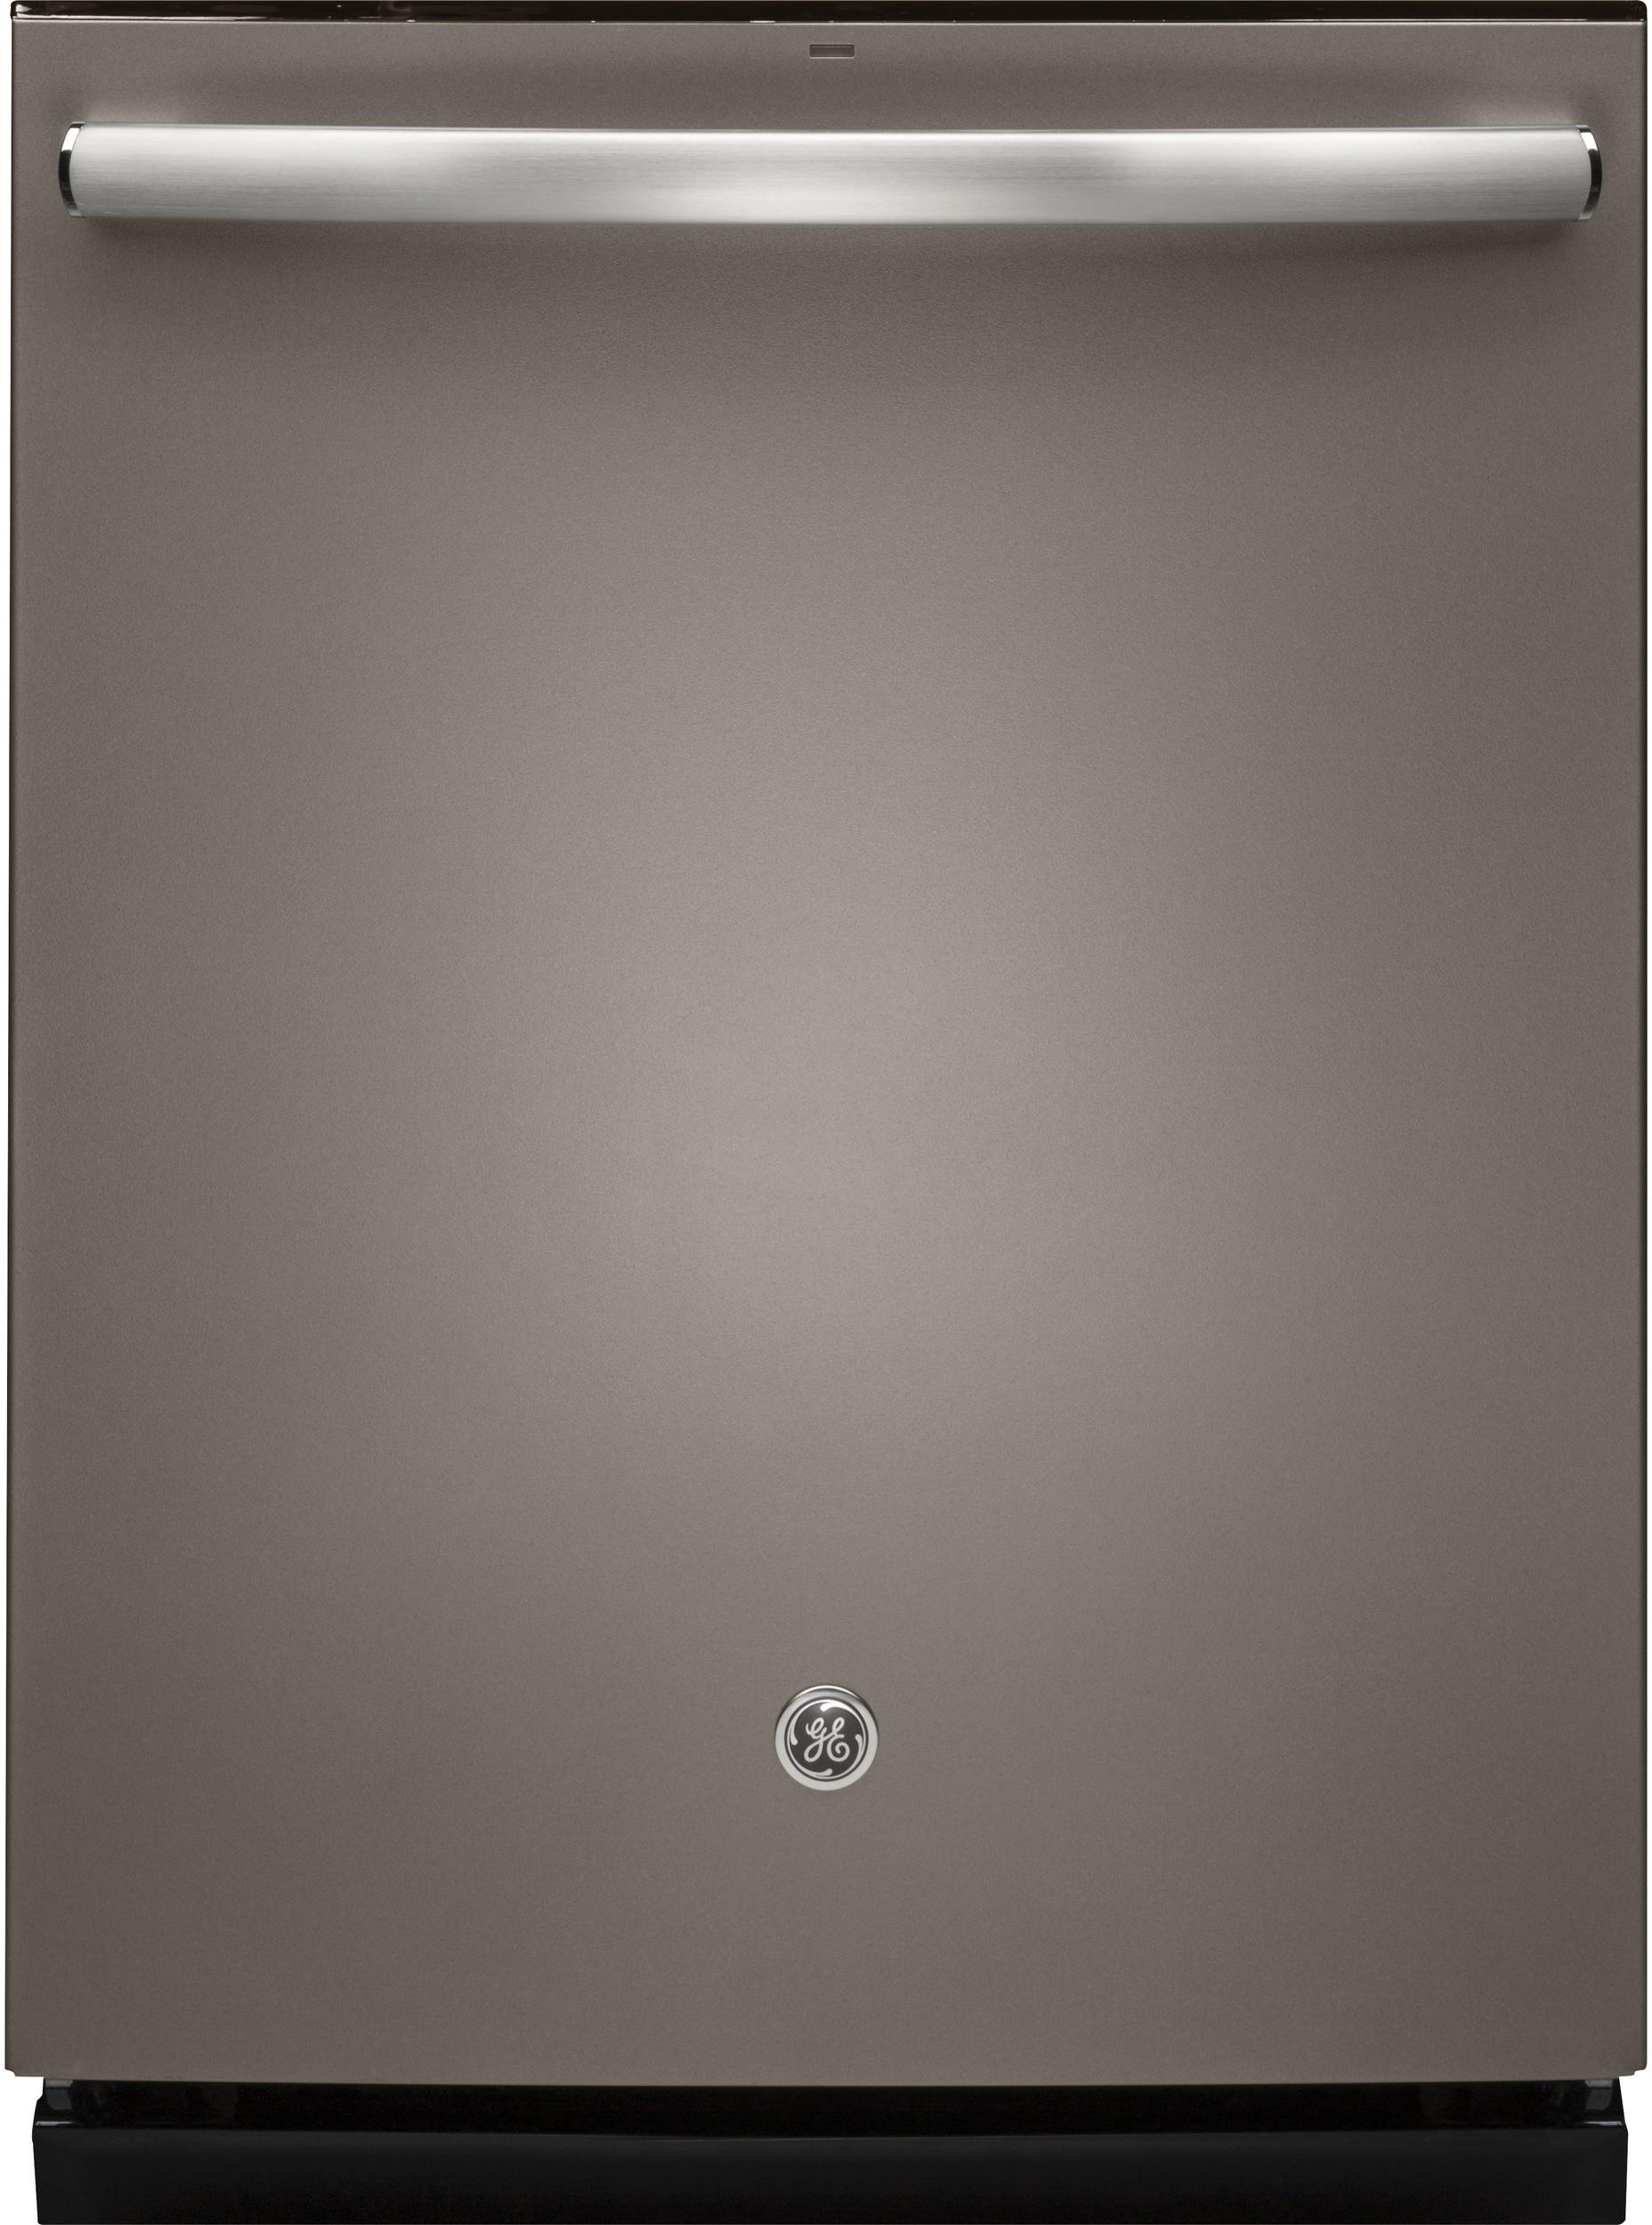 Stainless Steel Dishwasher Panel Kit Dishwashers